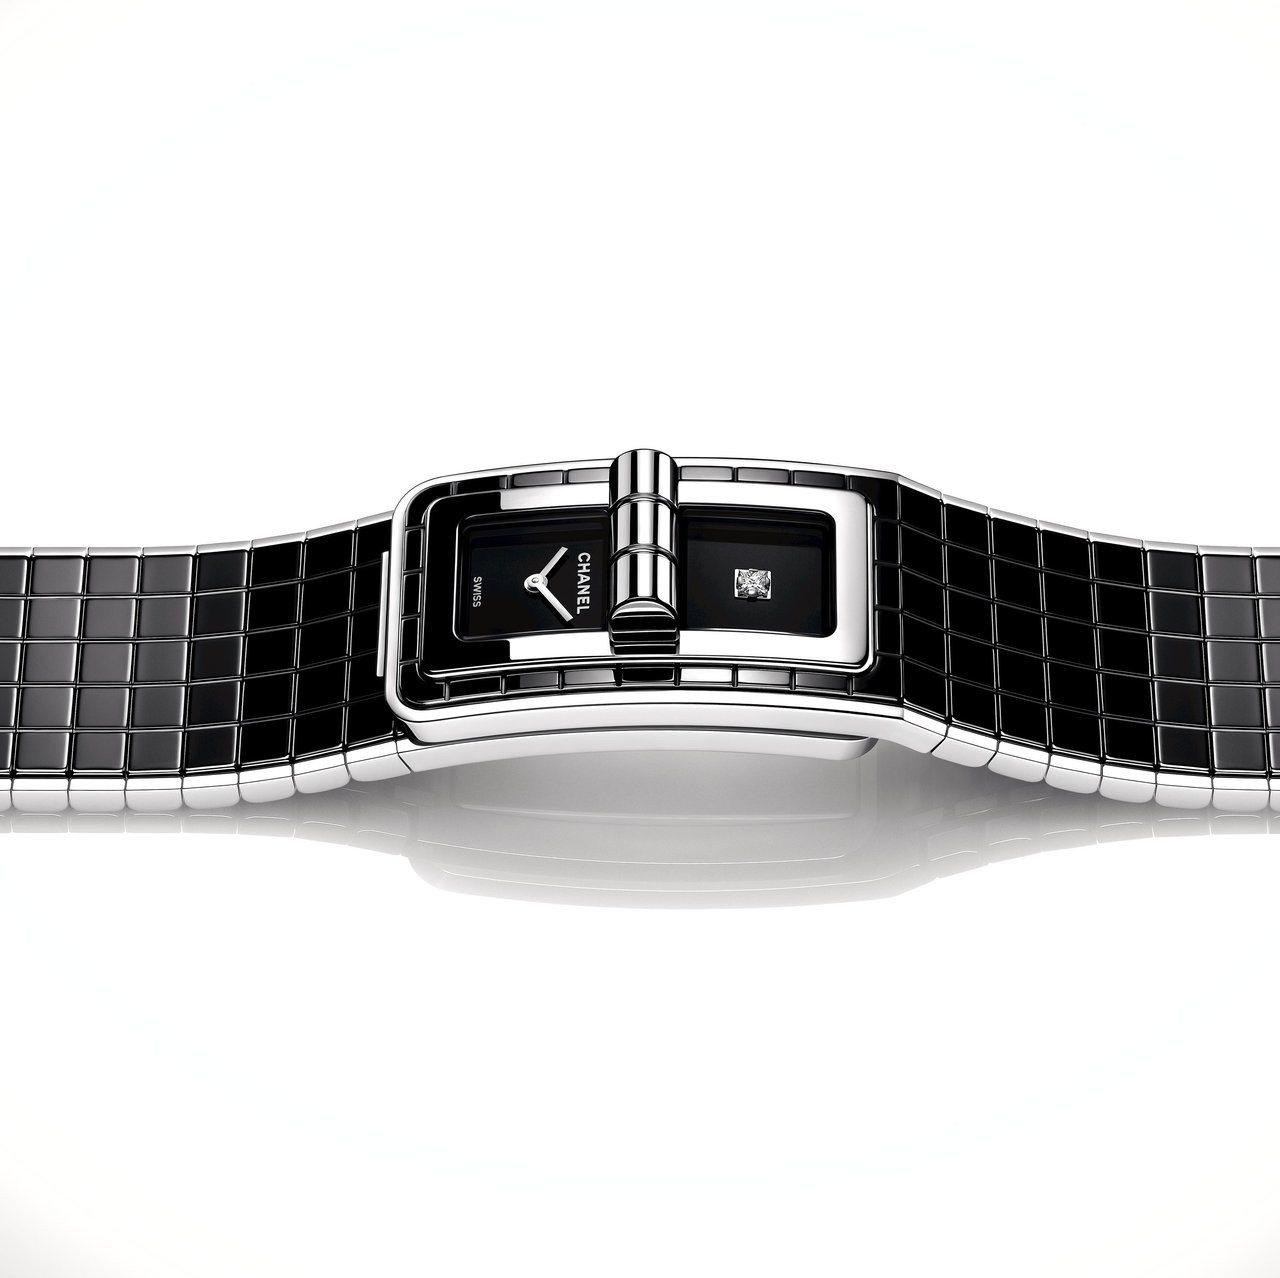 CODE COCO精鋼與黑色陶瓷腕表,黑色漆面表盤單獨鑲嵌一顆公主式切割鑽石,2...